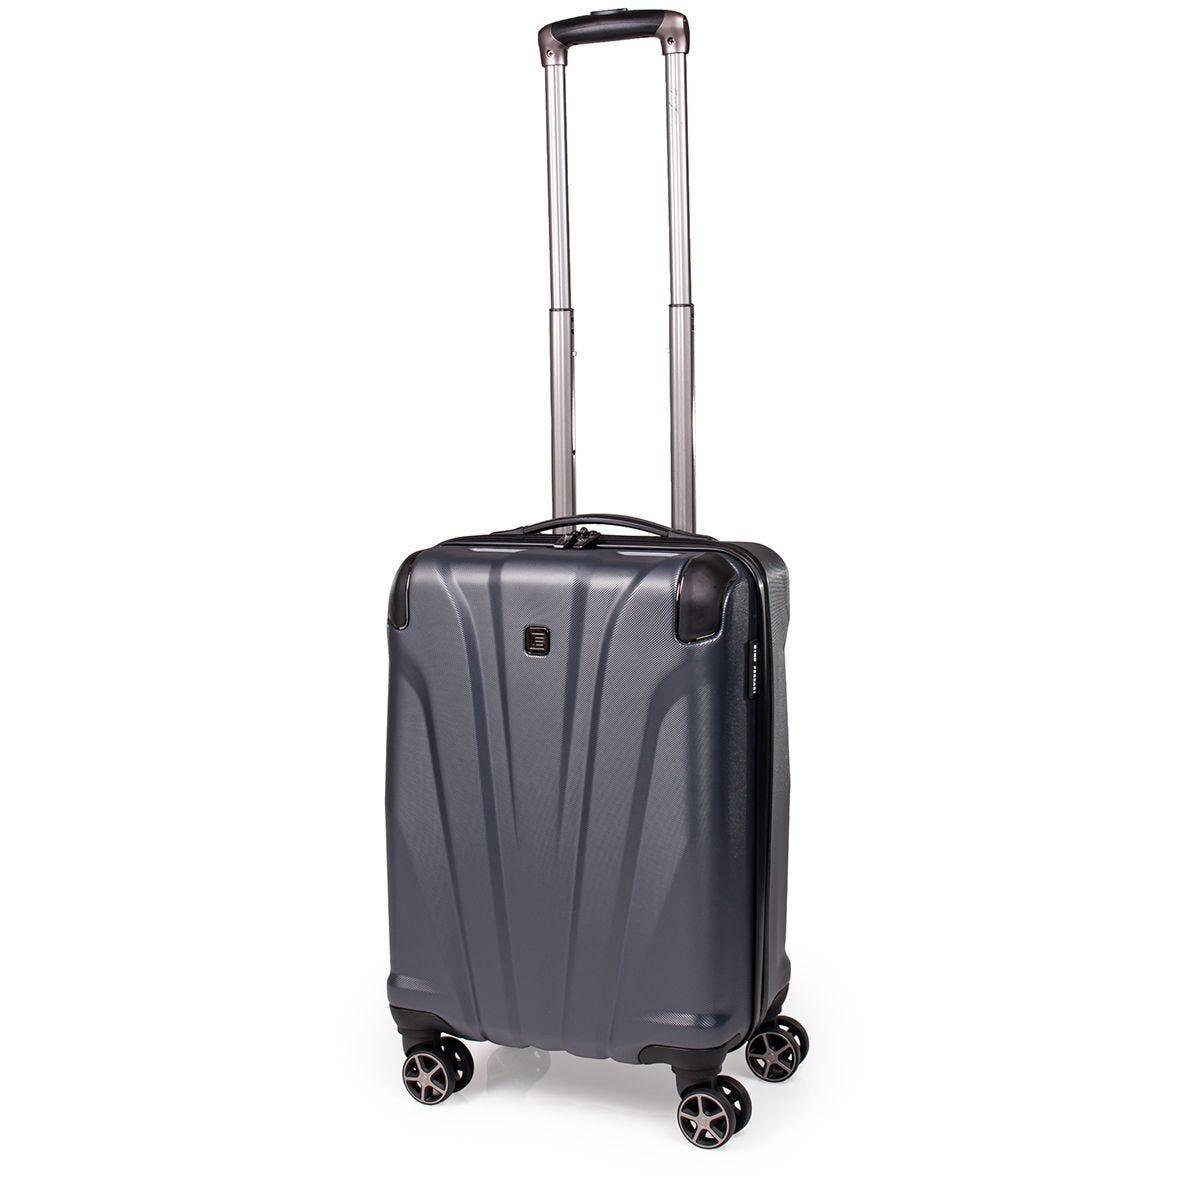 Gino Ferrari Quasar ABS Small Suitcase - Dark Grey